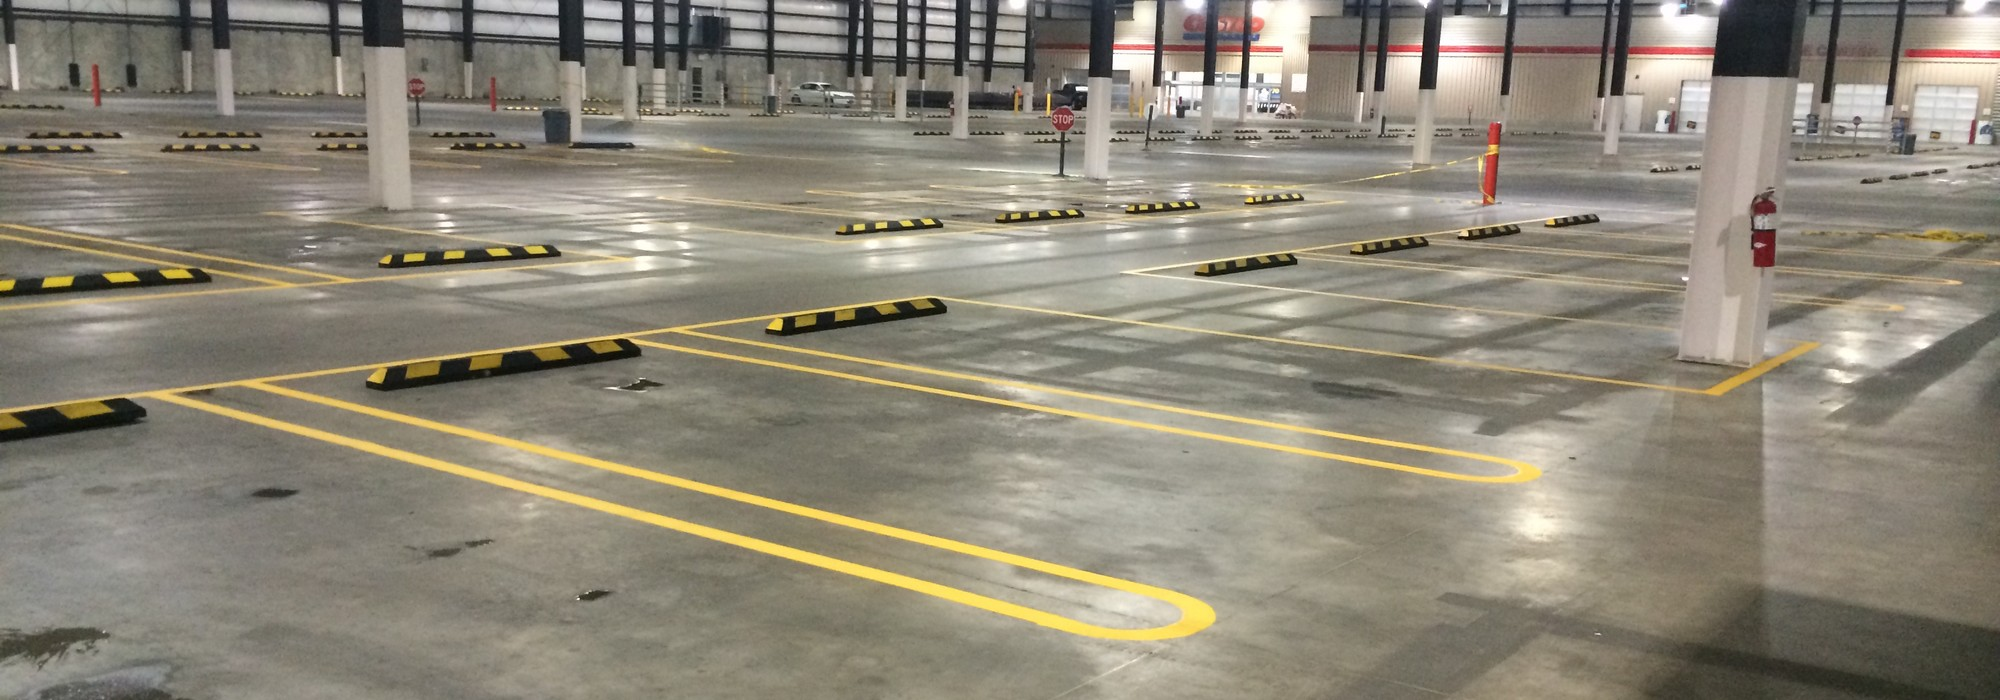 slide-parking-lot-striping-costco-iowa